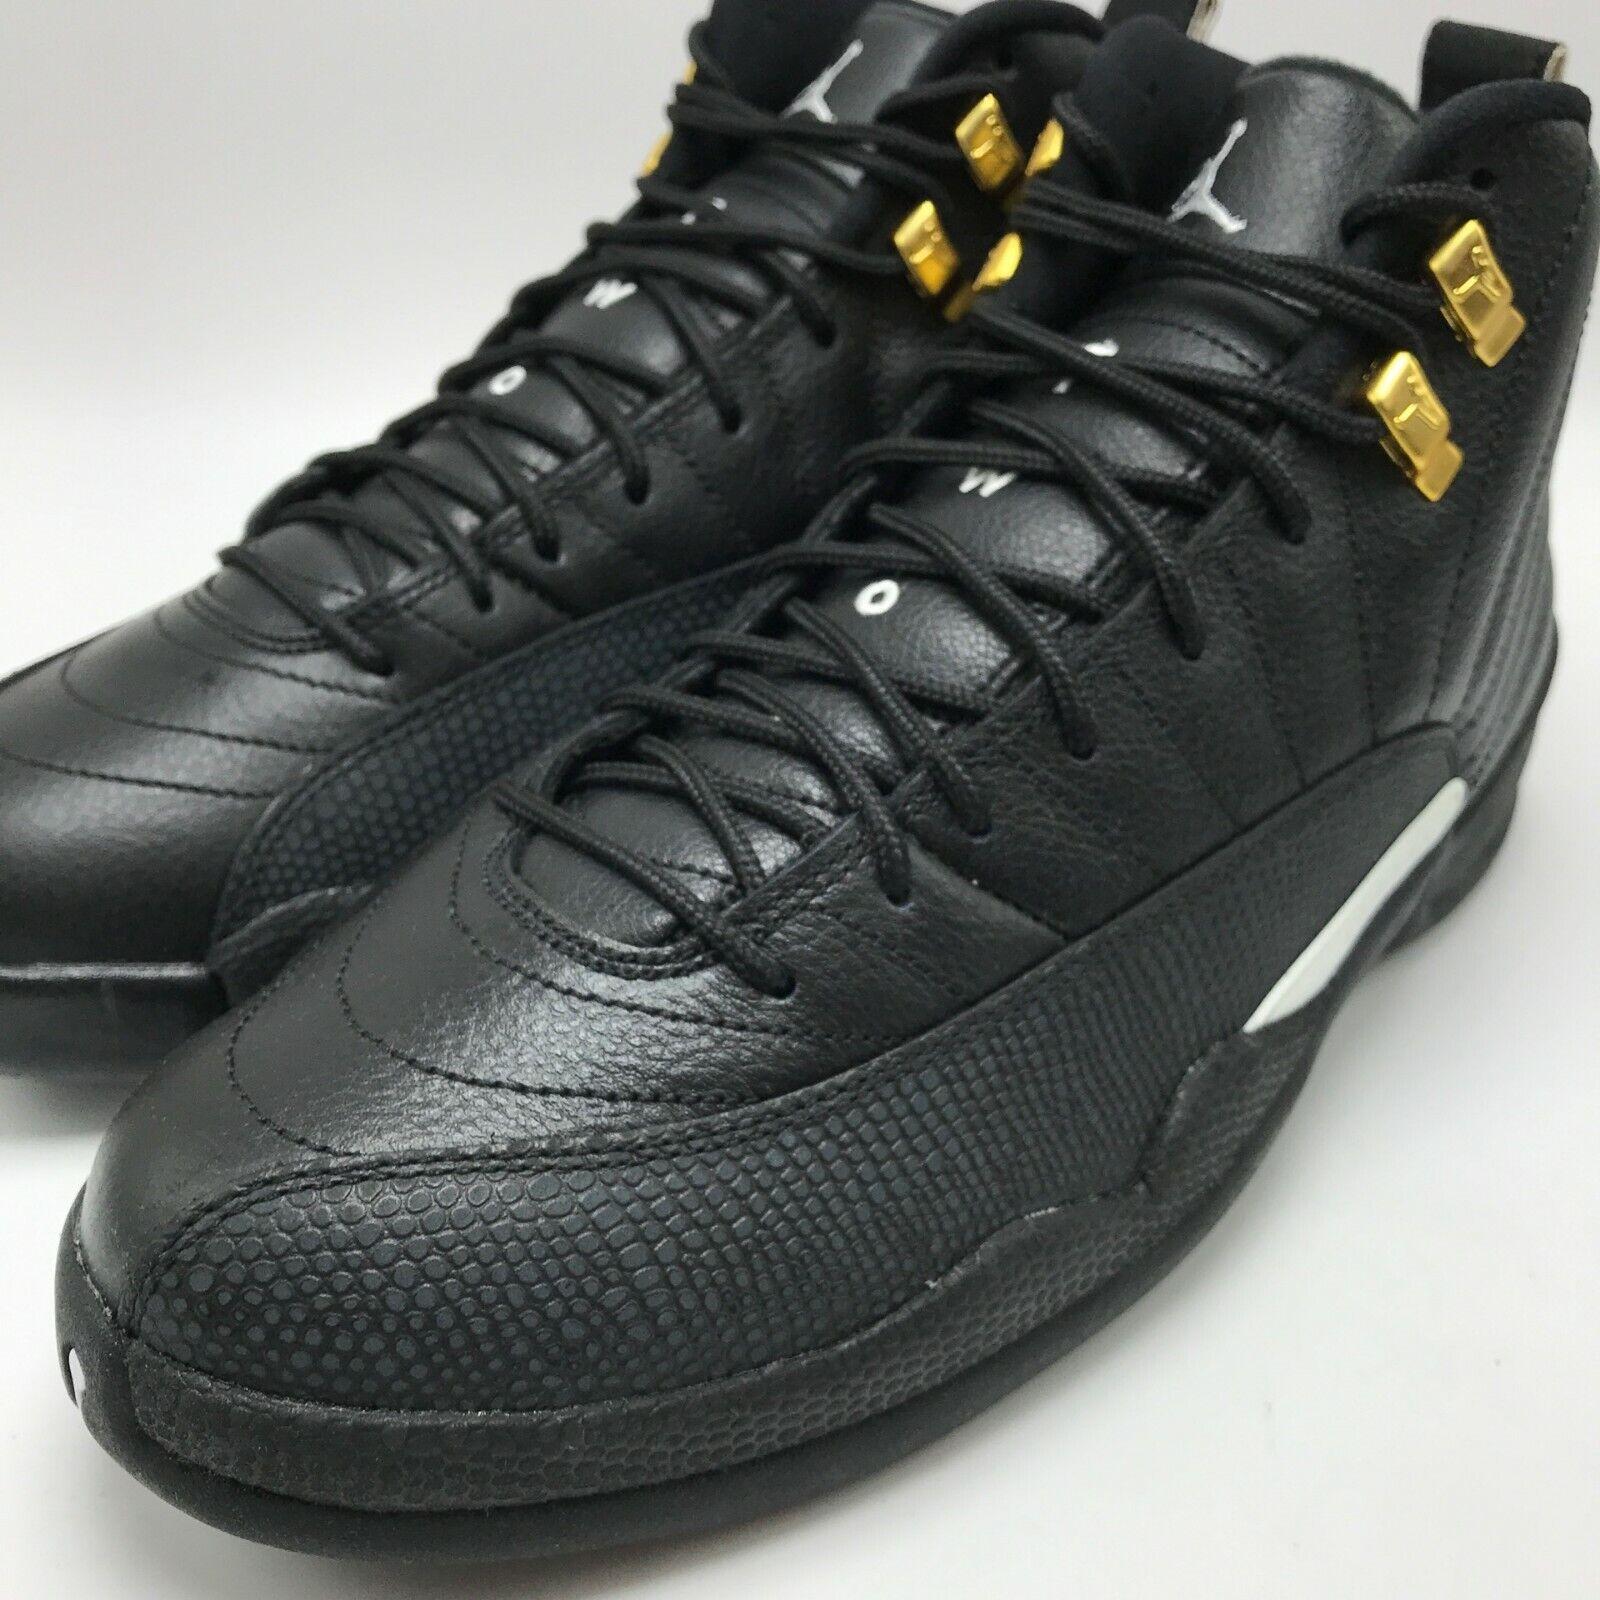 Nike Air Jordan 12 Retro Men's Basketball Shoes BlackWhite Black 130690 013